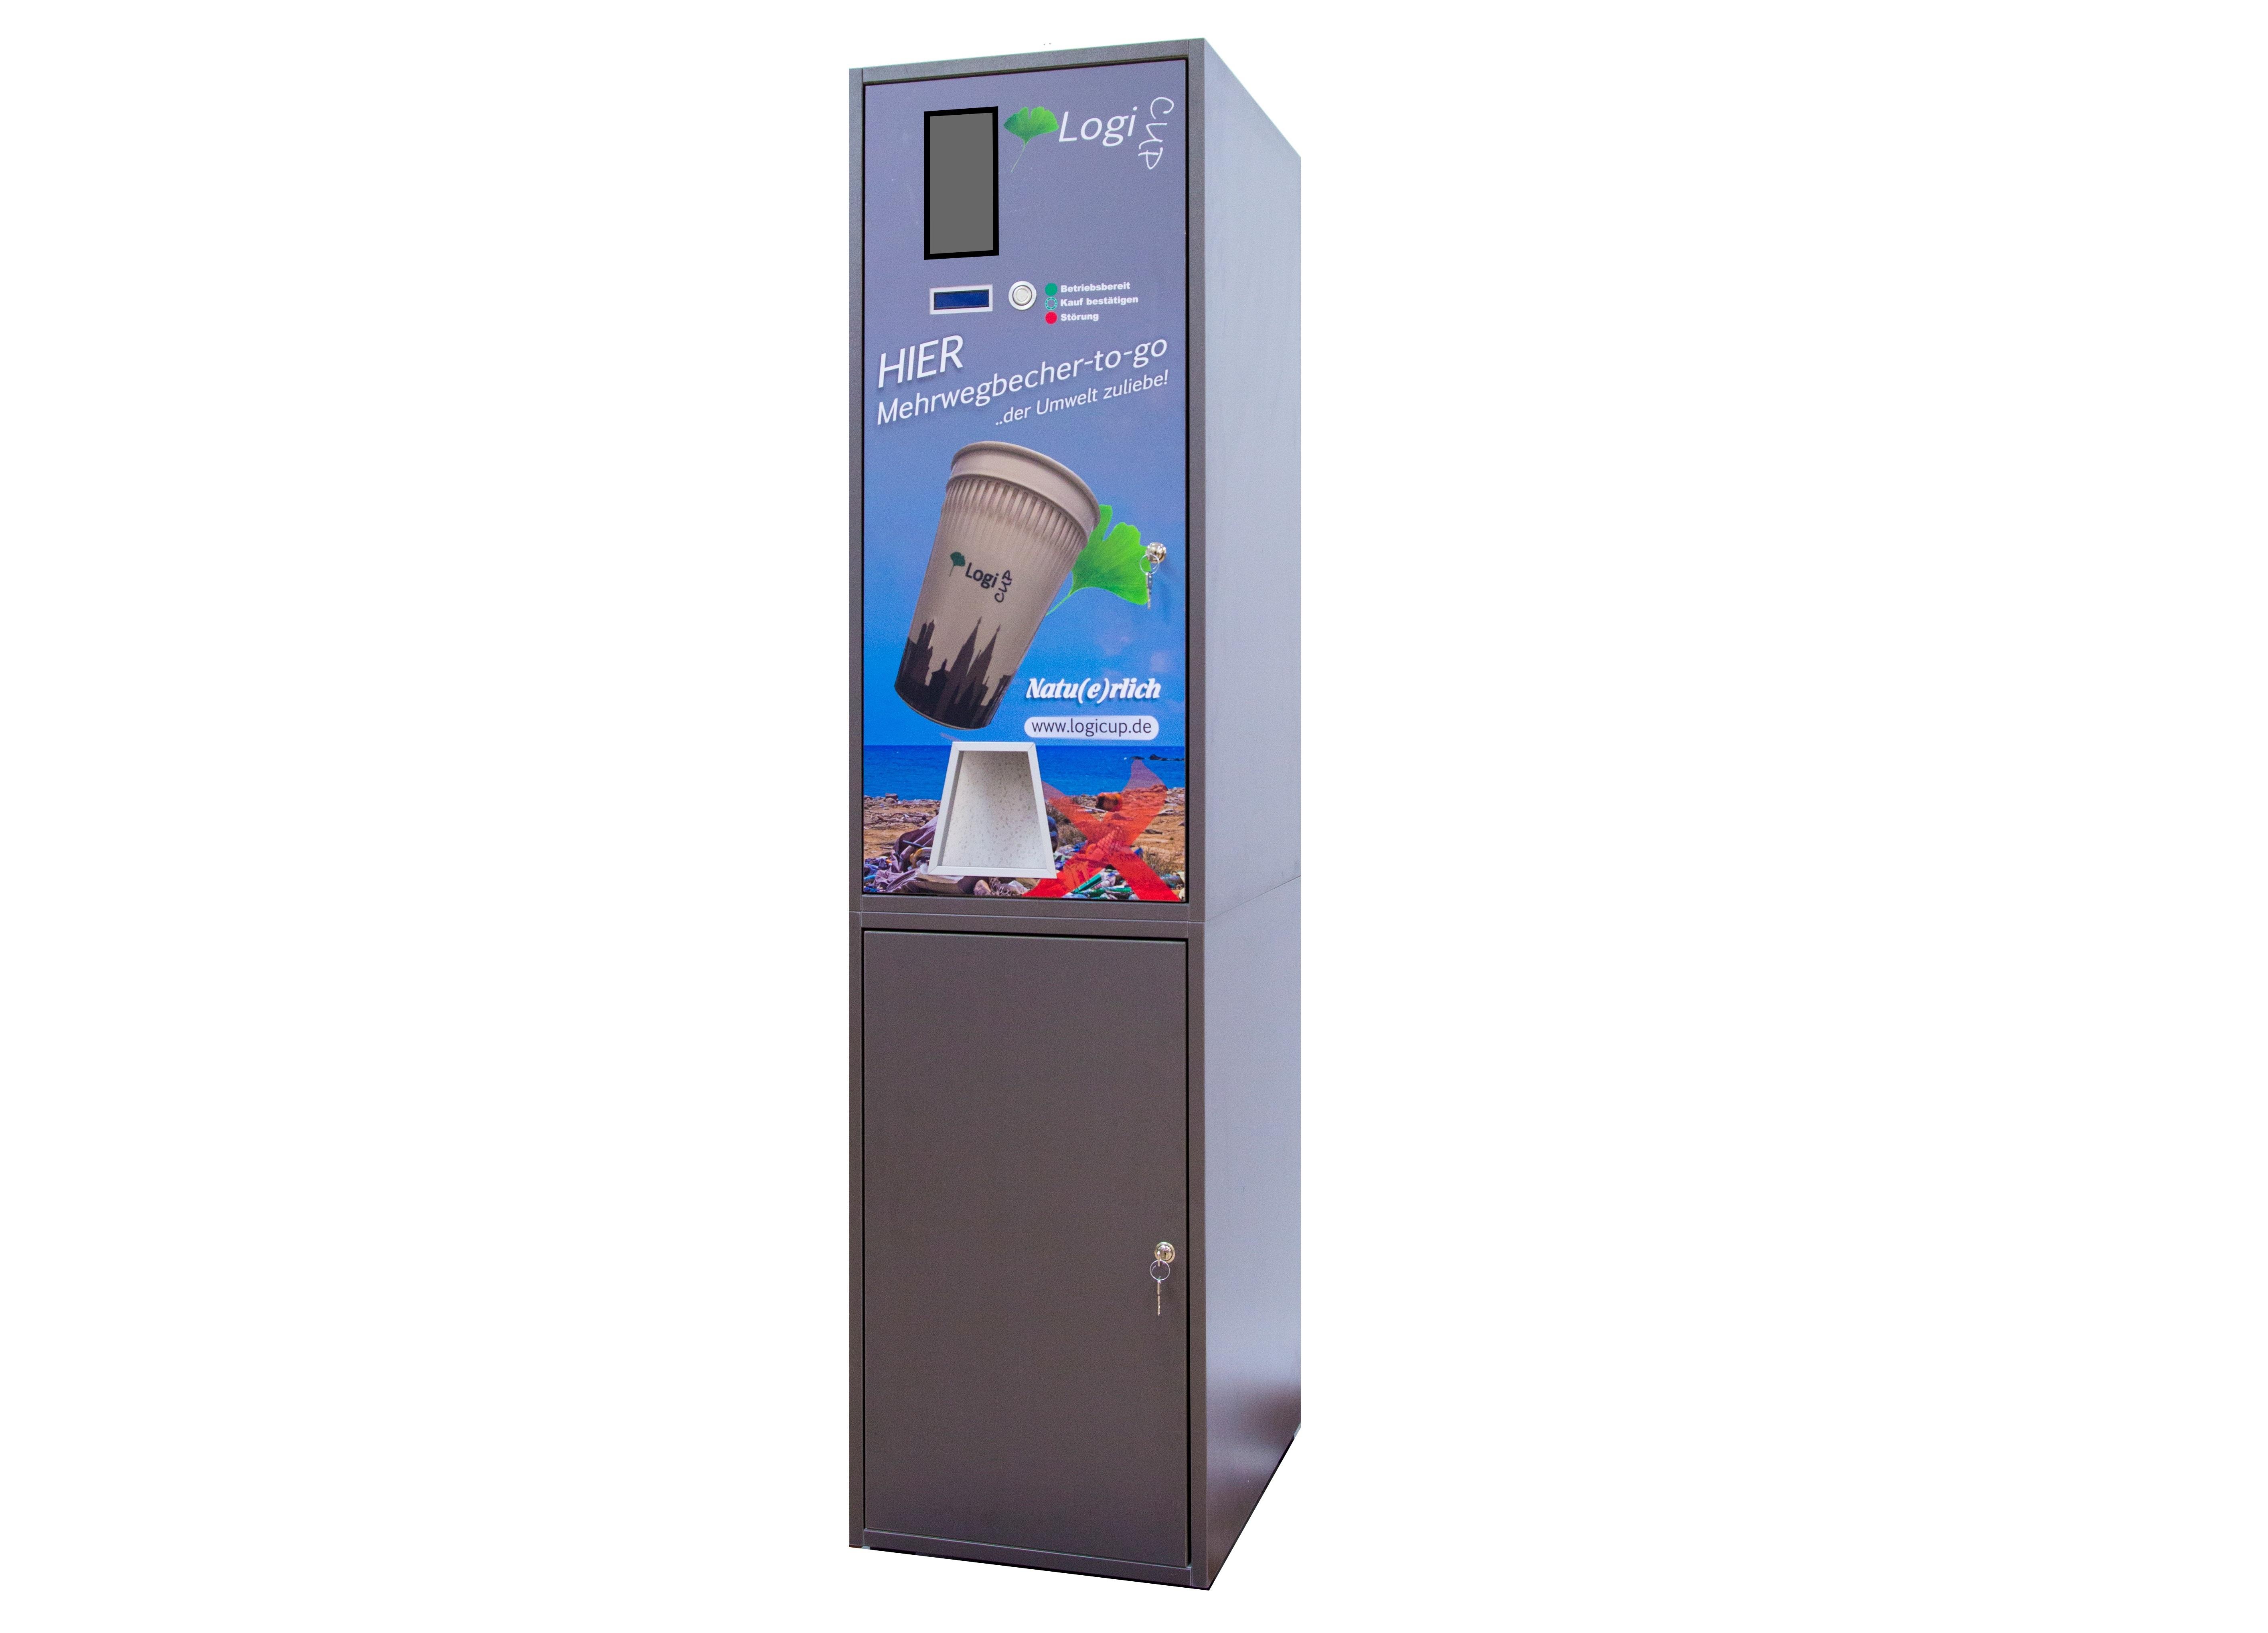 Becherausgabeautomat - Standgerät mit Unterschrank